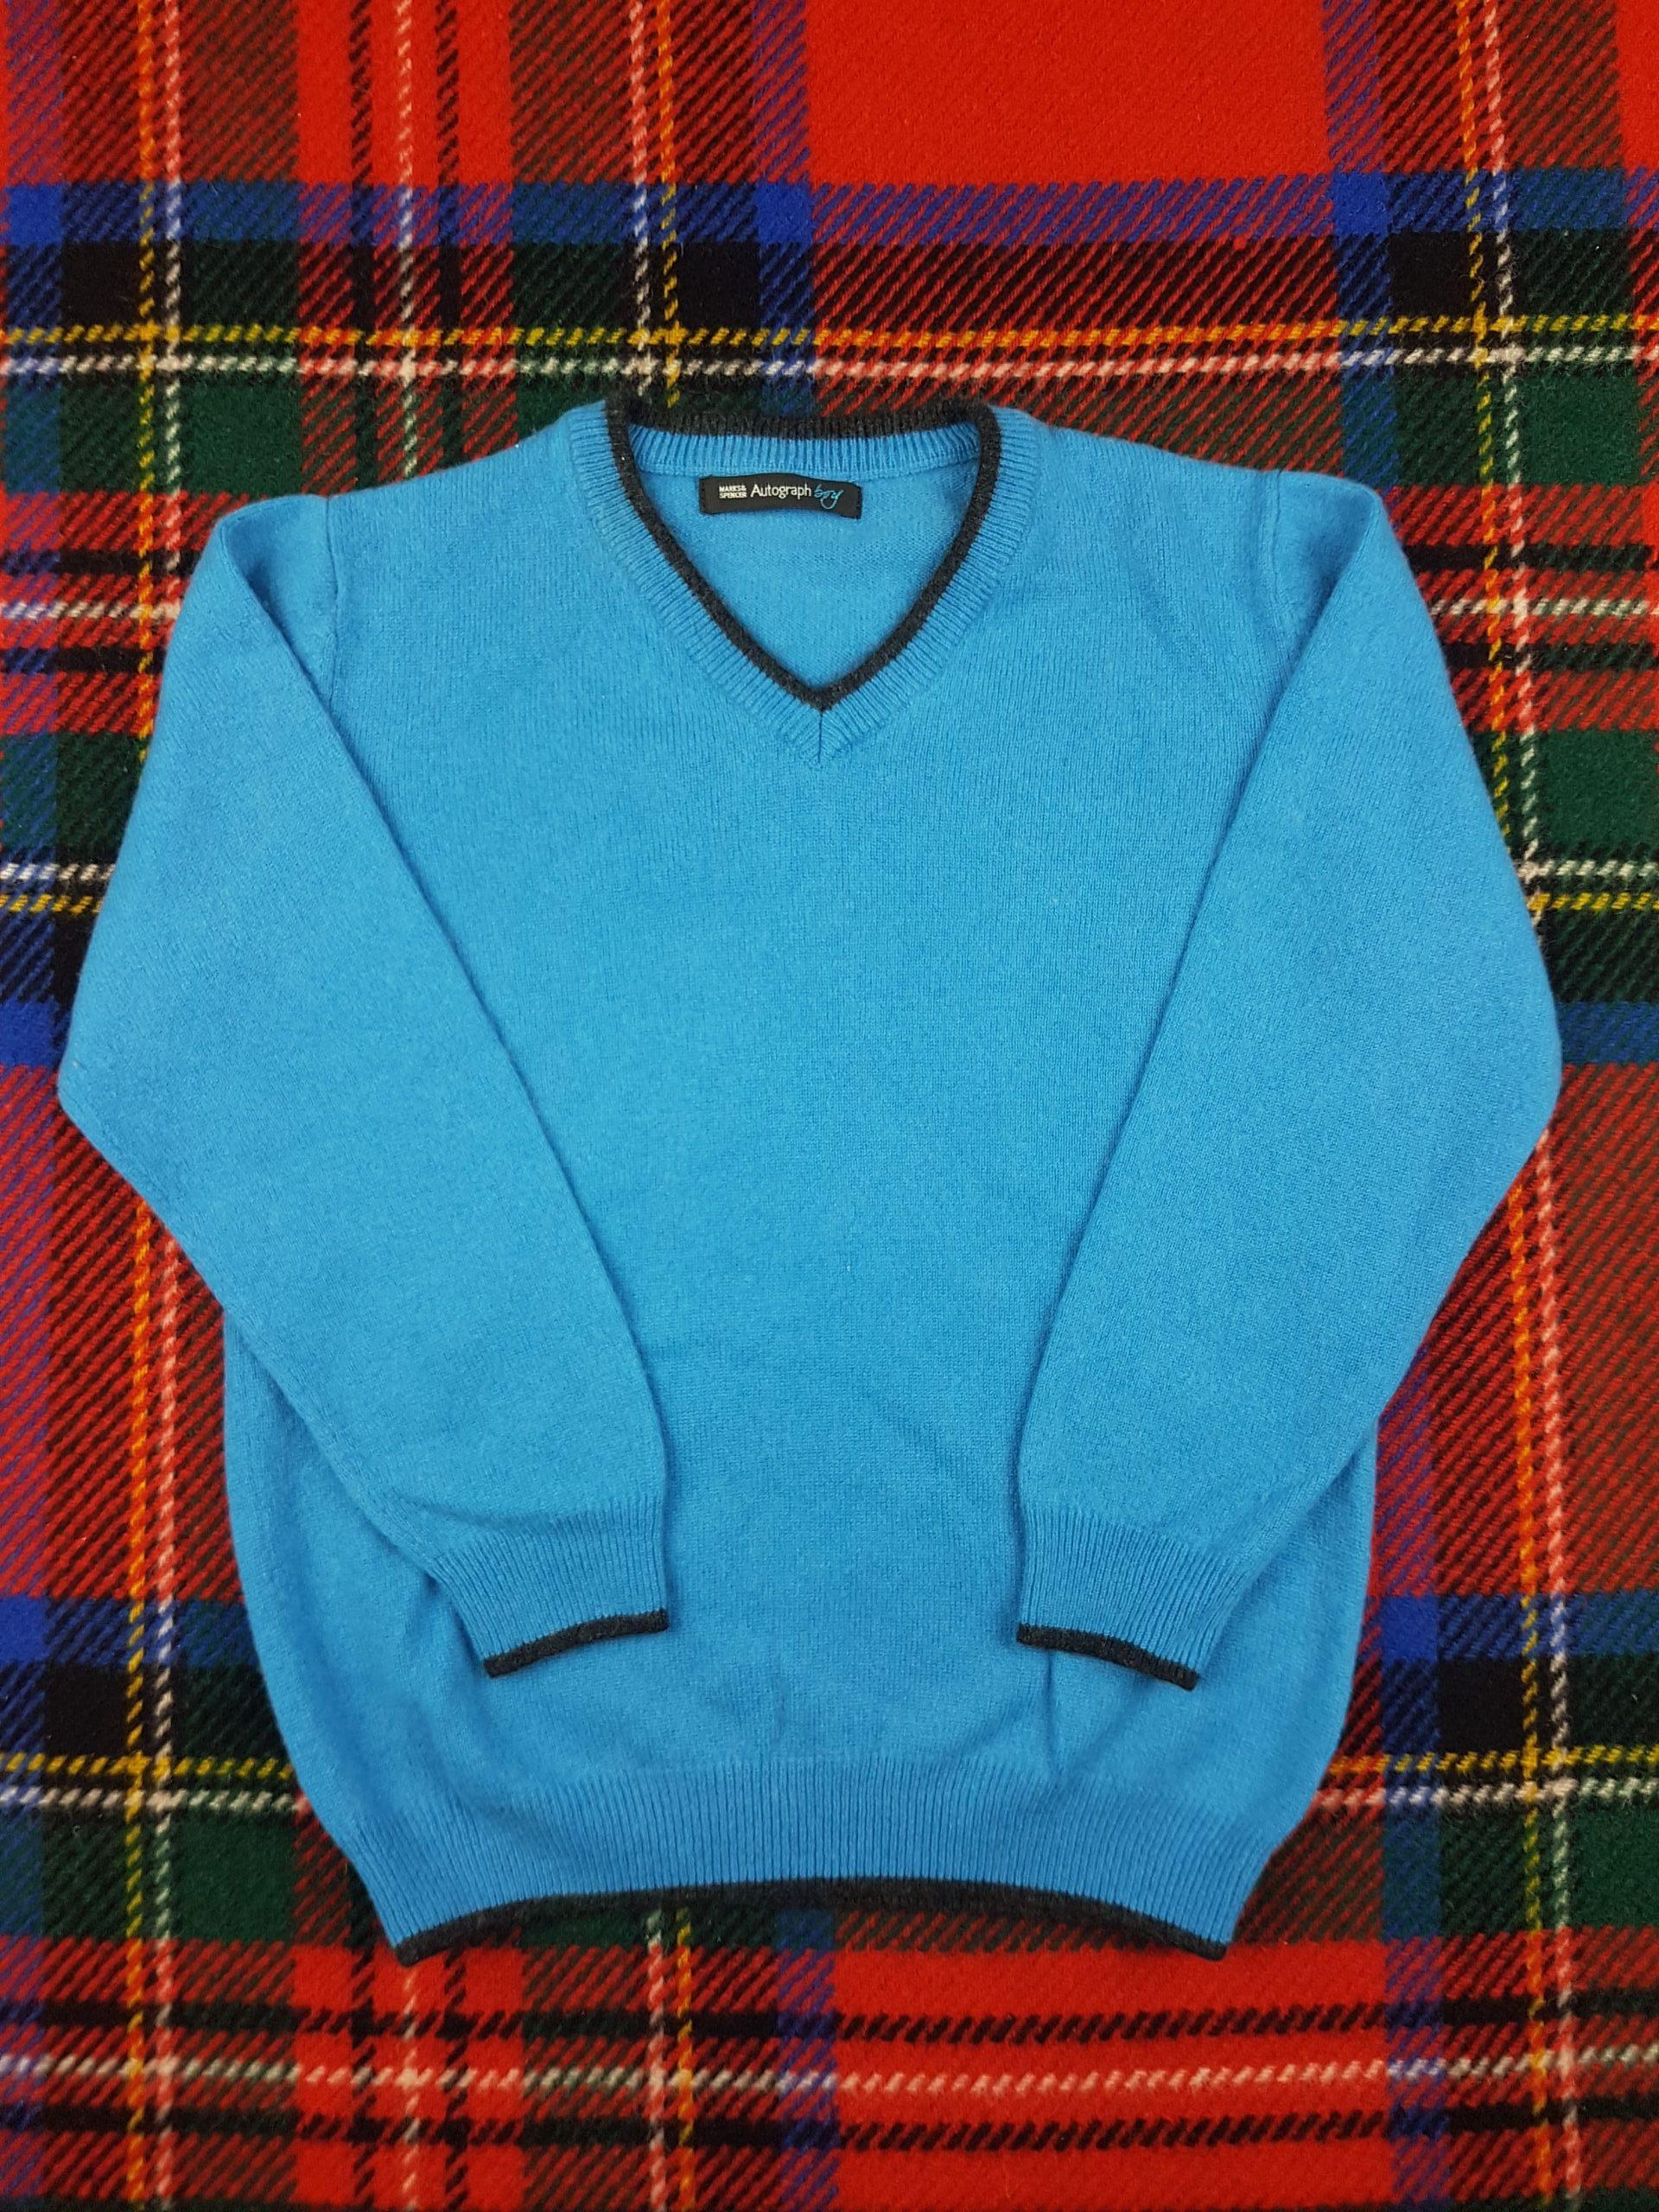 M&S Children's V Neck Cashmere Sweater in Cornflour Blue | Softtouch Cashmere